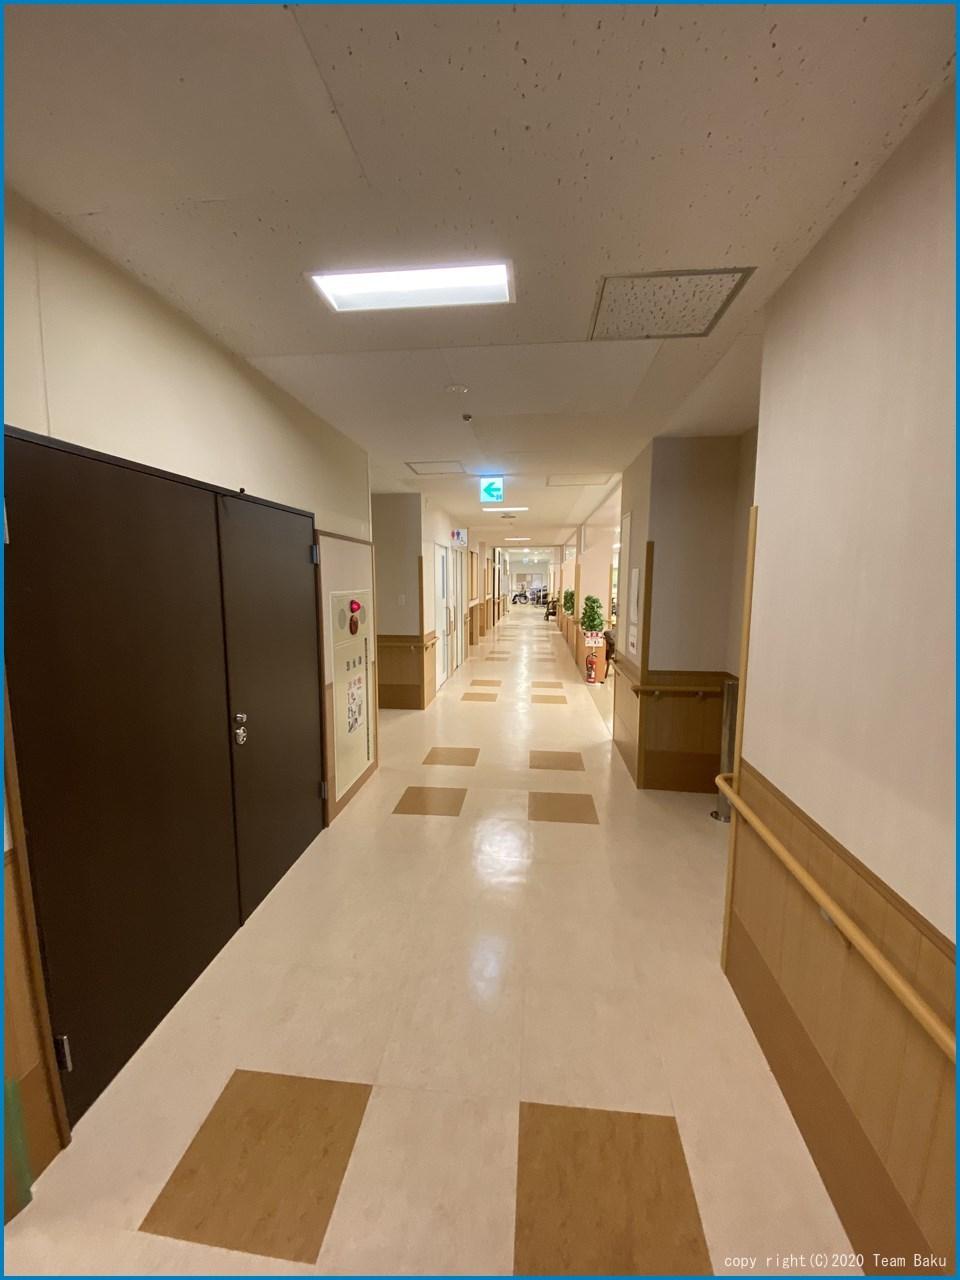 N病院グループ Nナーシング南館 改修・増築工事 6_c0376508_17105719.jpg